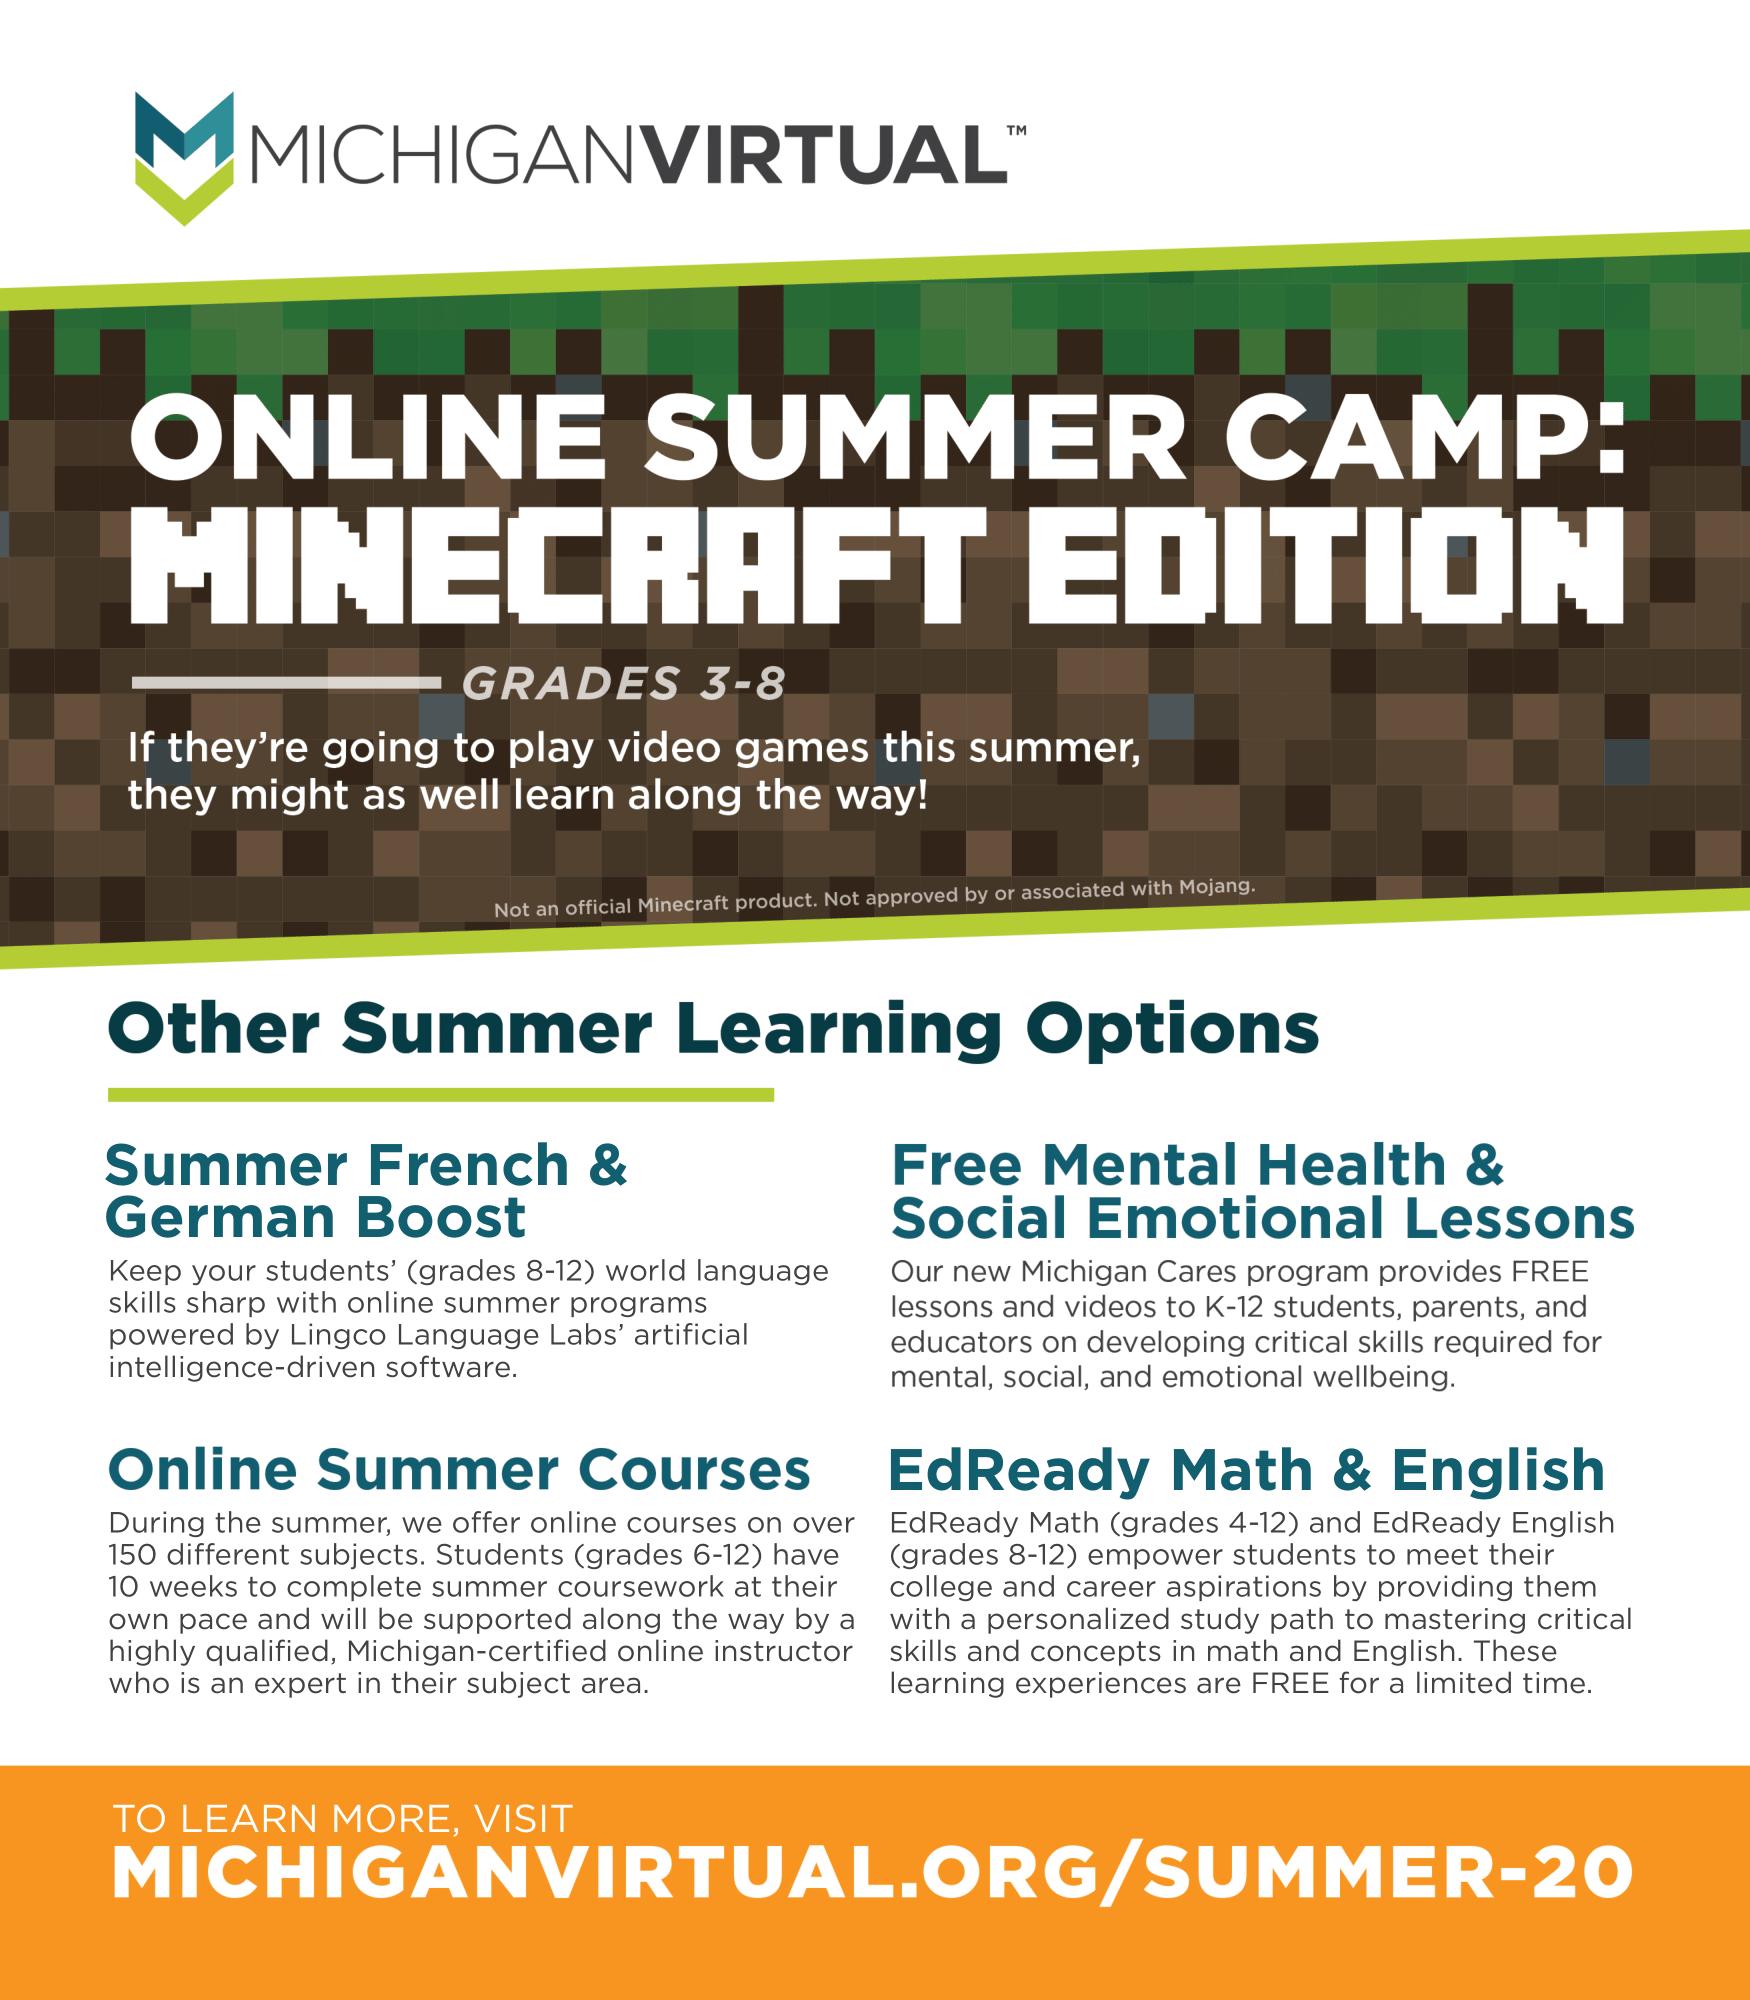 Michigan Virtual Summer Programs Flyer